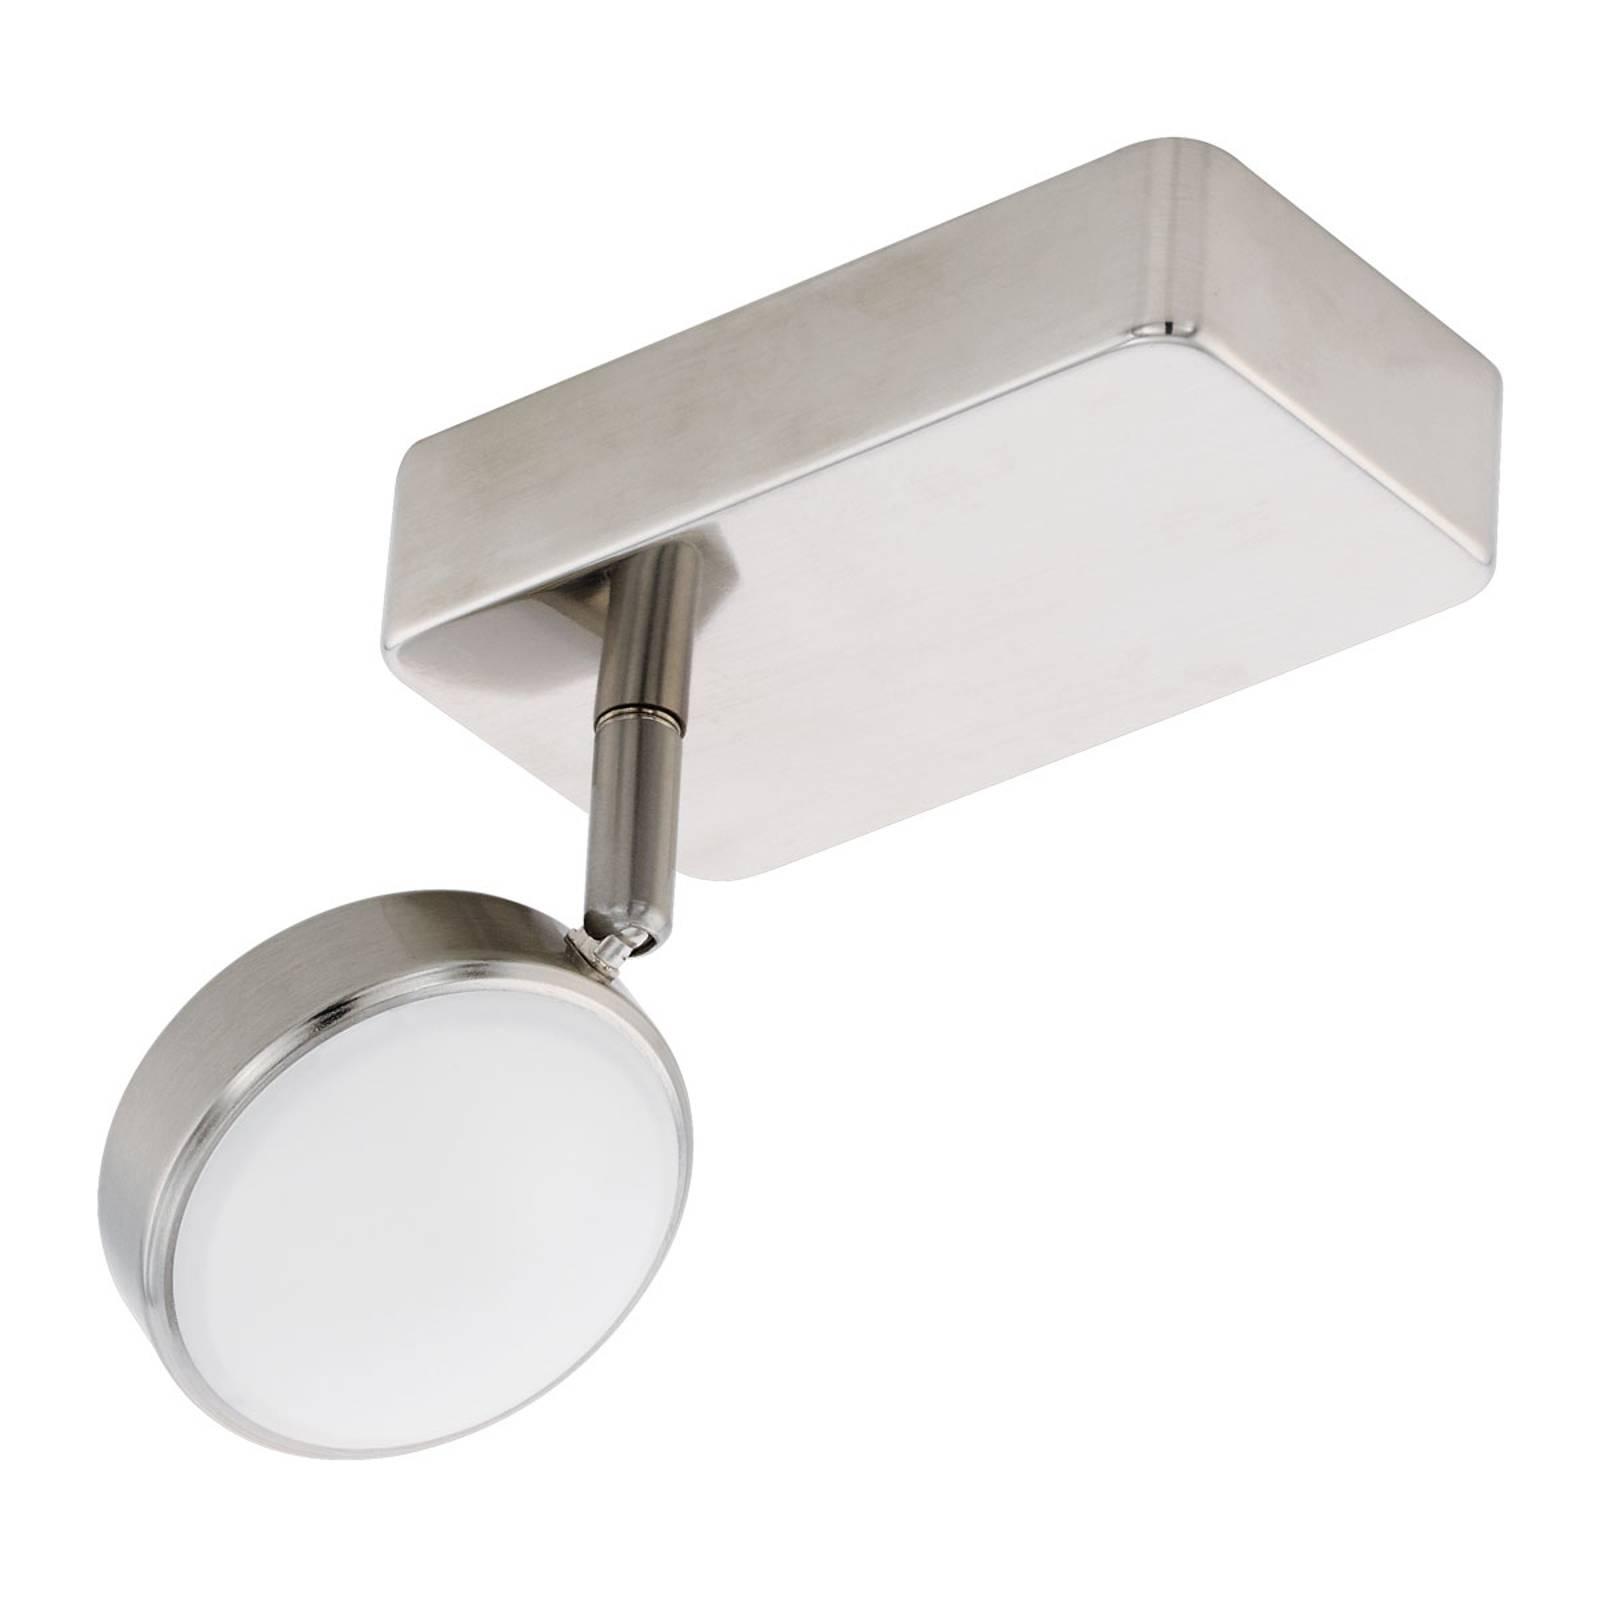 EGLO connect Corropoli-C -LED-kattospotti 1-lamp.